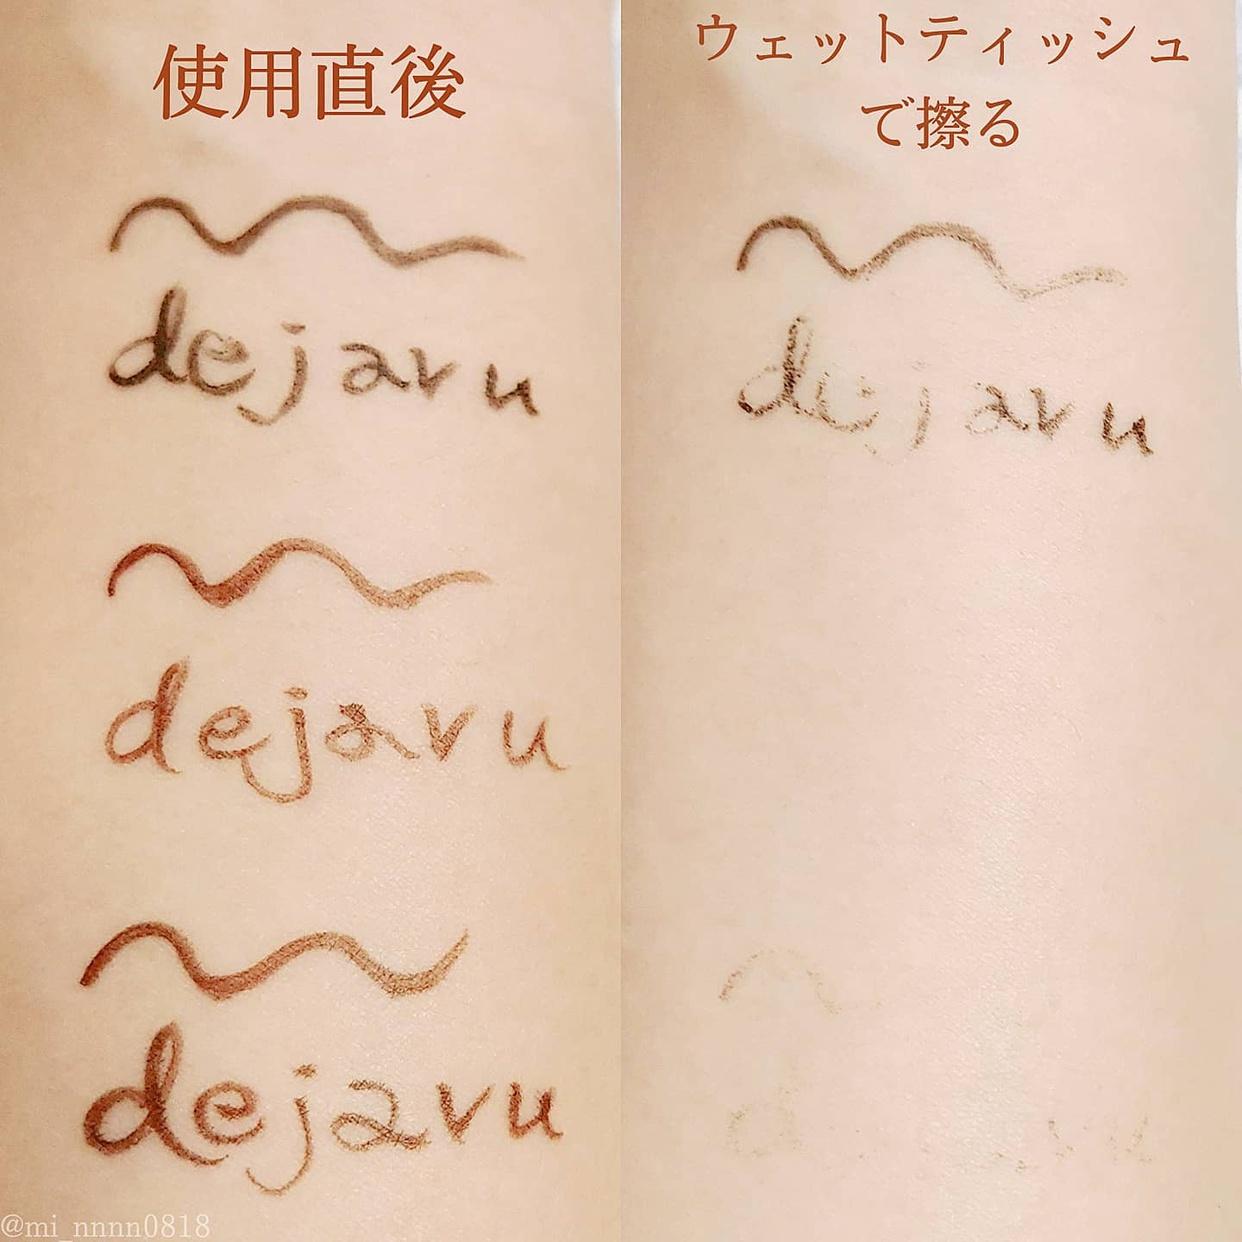 dejavu(デジャヴュ) 密着アイライナー ラスティンファイン ショート筆リキッドを使ったmiiさんのクチコミ画像3